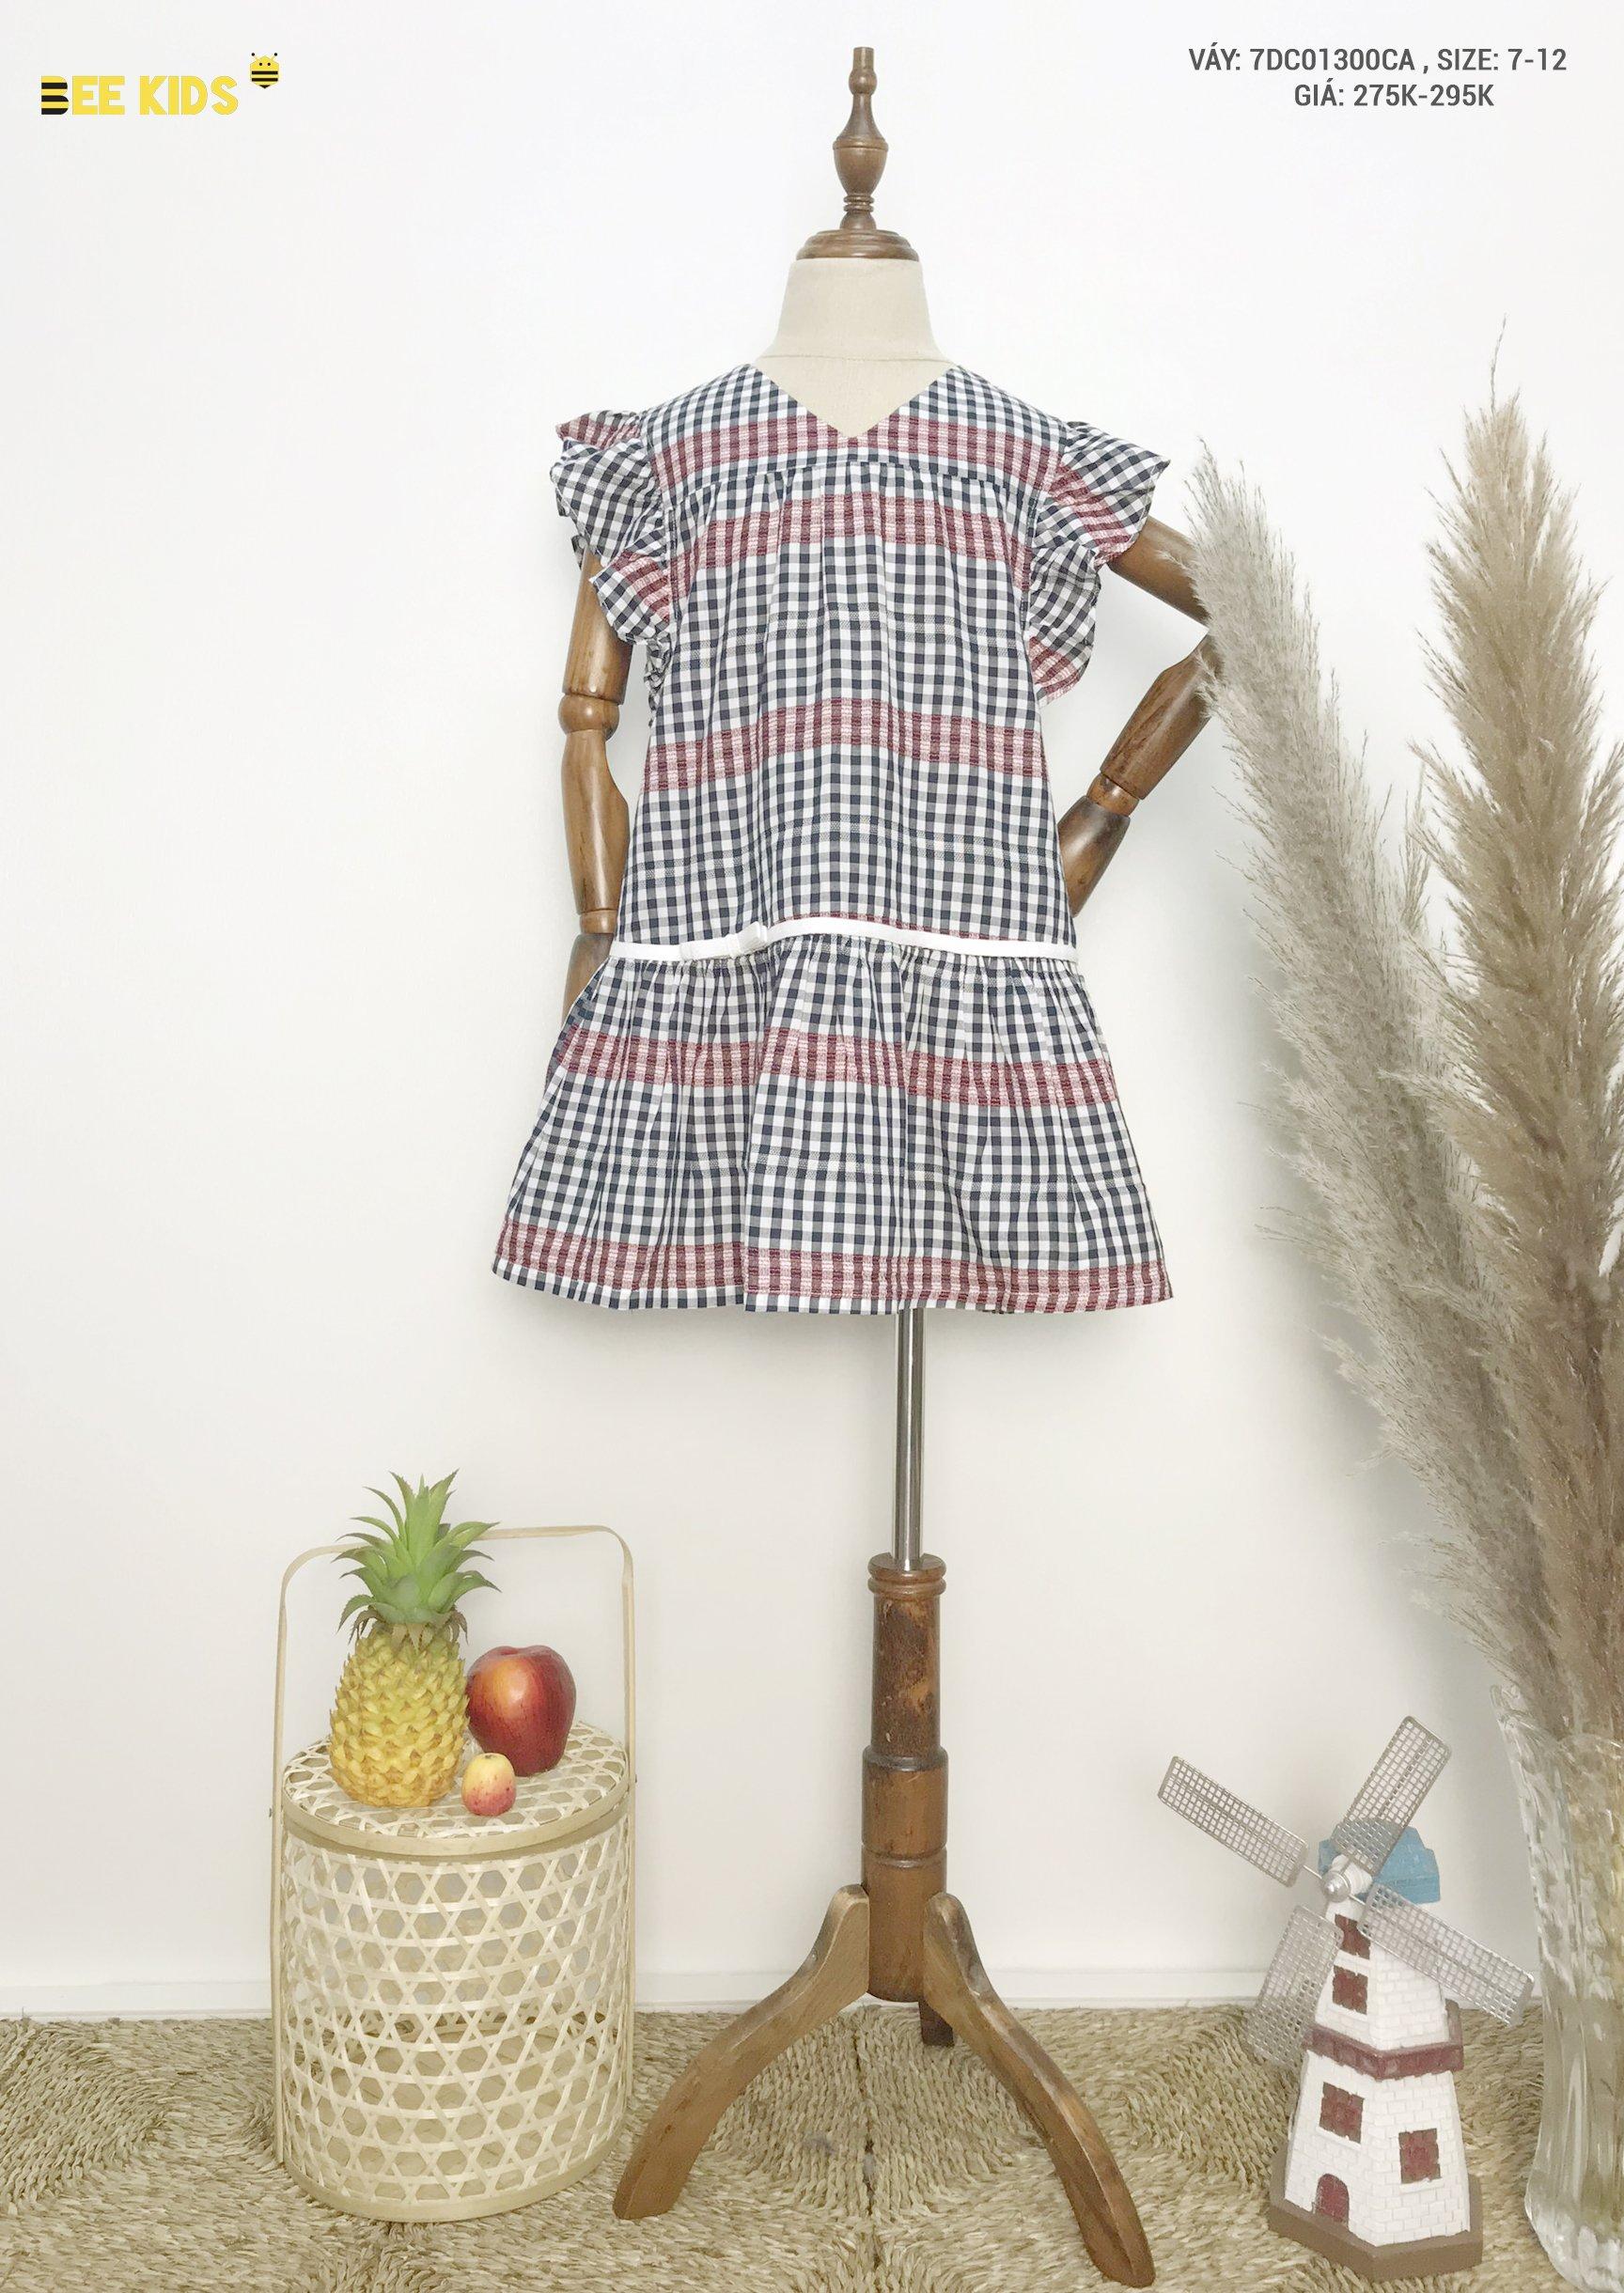 Váy thô bé gái 7-12 tuổi